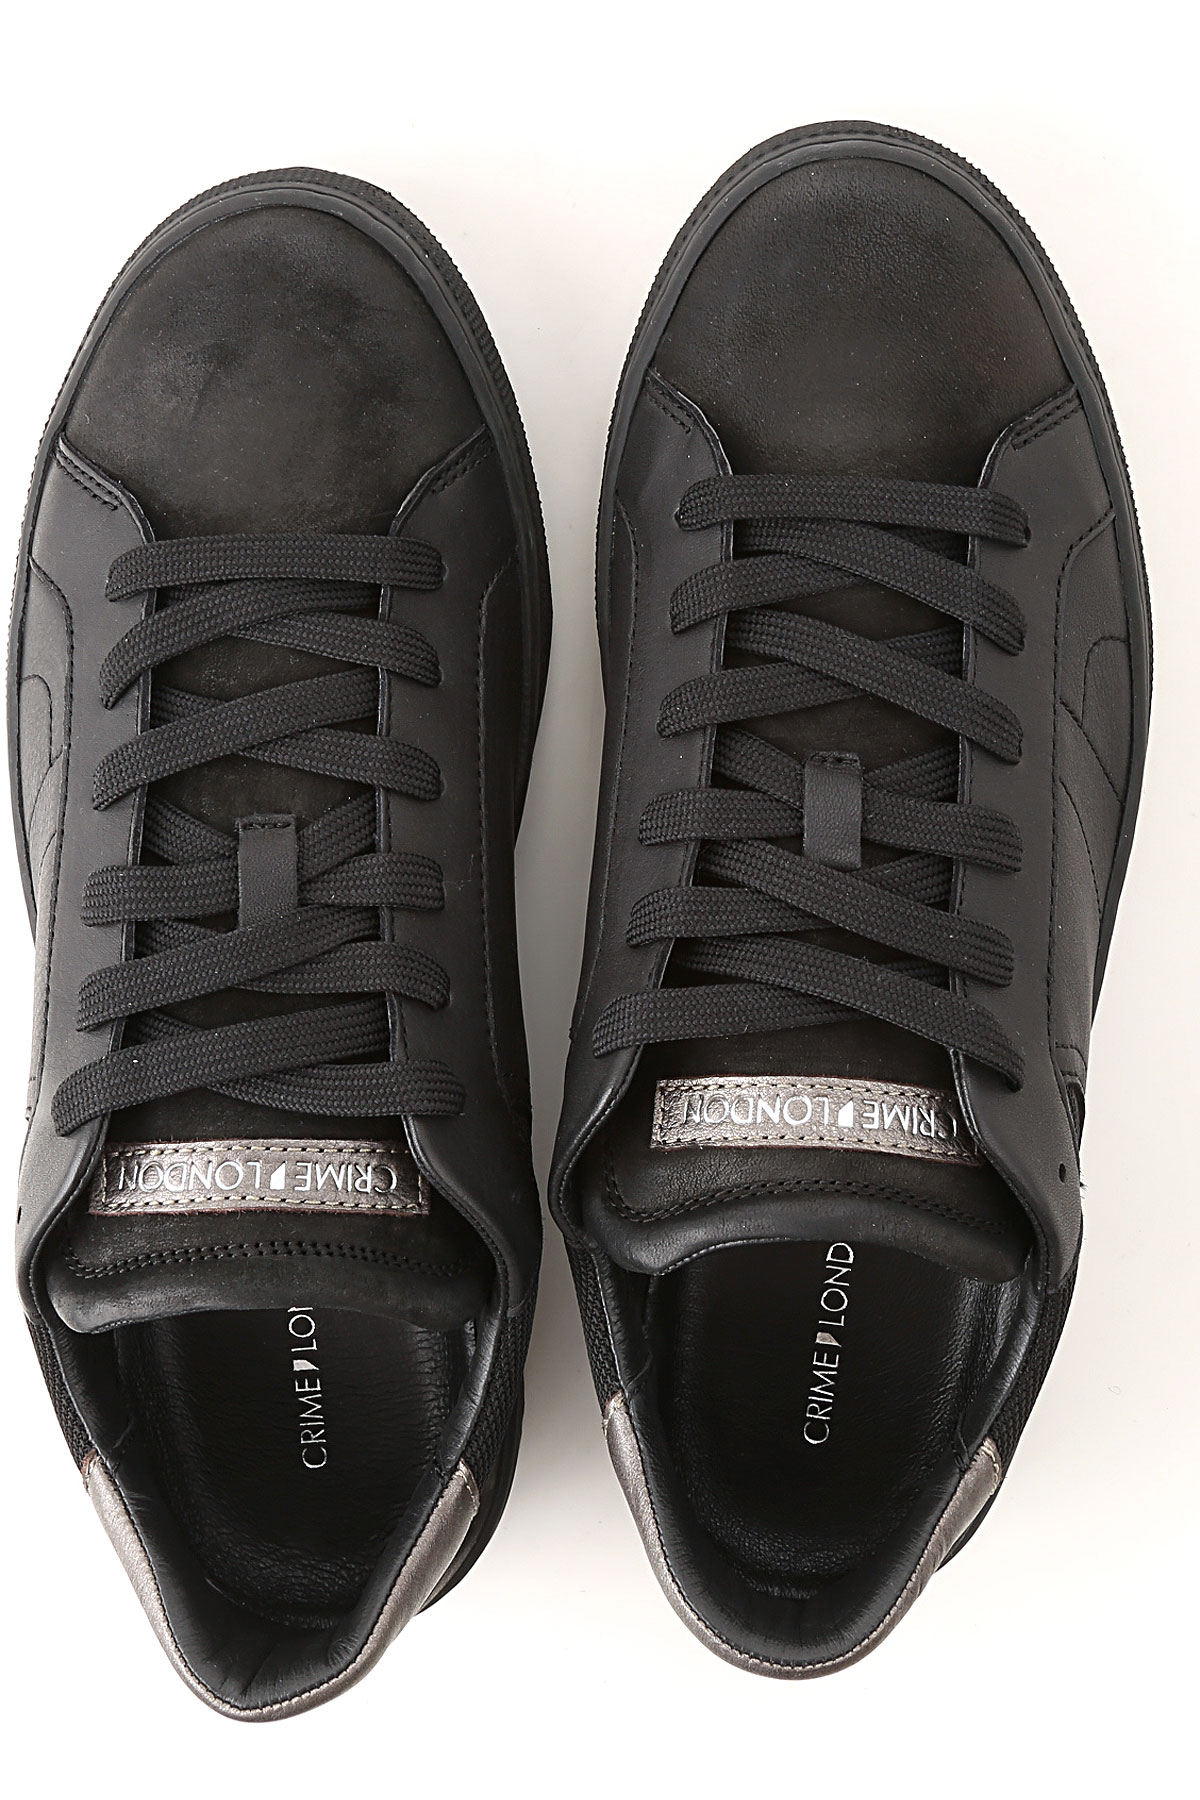 nbsp; Para 2018 19 Negro invierno Otoño Zapatos Crime Hombres zwfp8qq